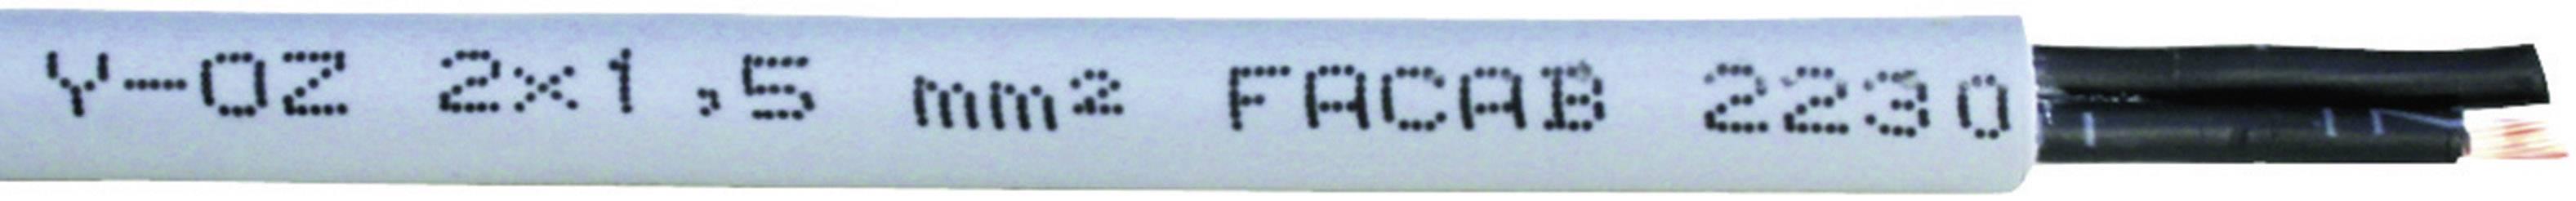 Riadiaci kábel Faber Kabel YSLY-OZ 030871, 7 x 0.50 mm², vonkajší Ø 6.80 mm, 500 V, metrový tovar, sivá